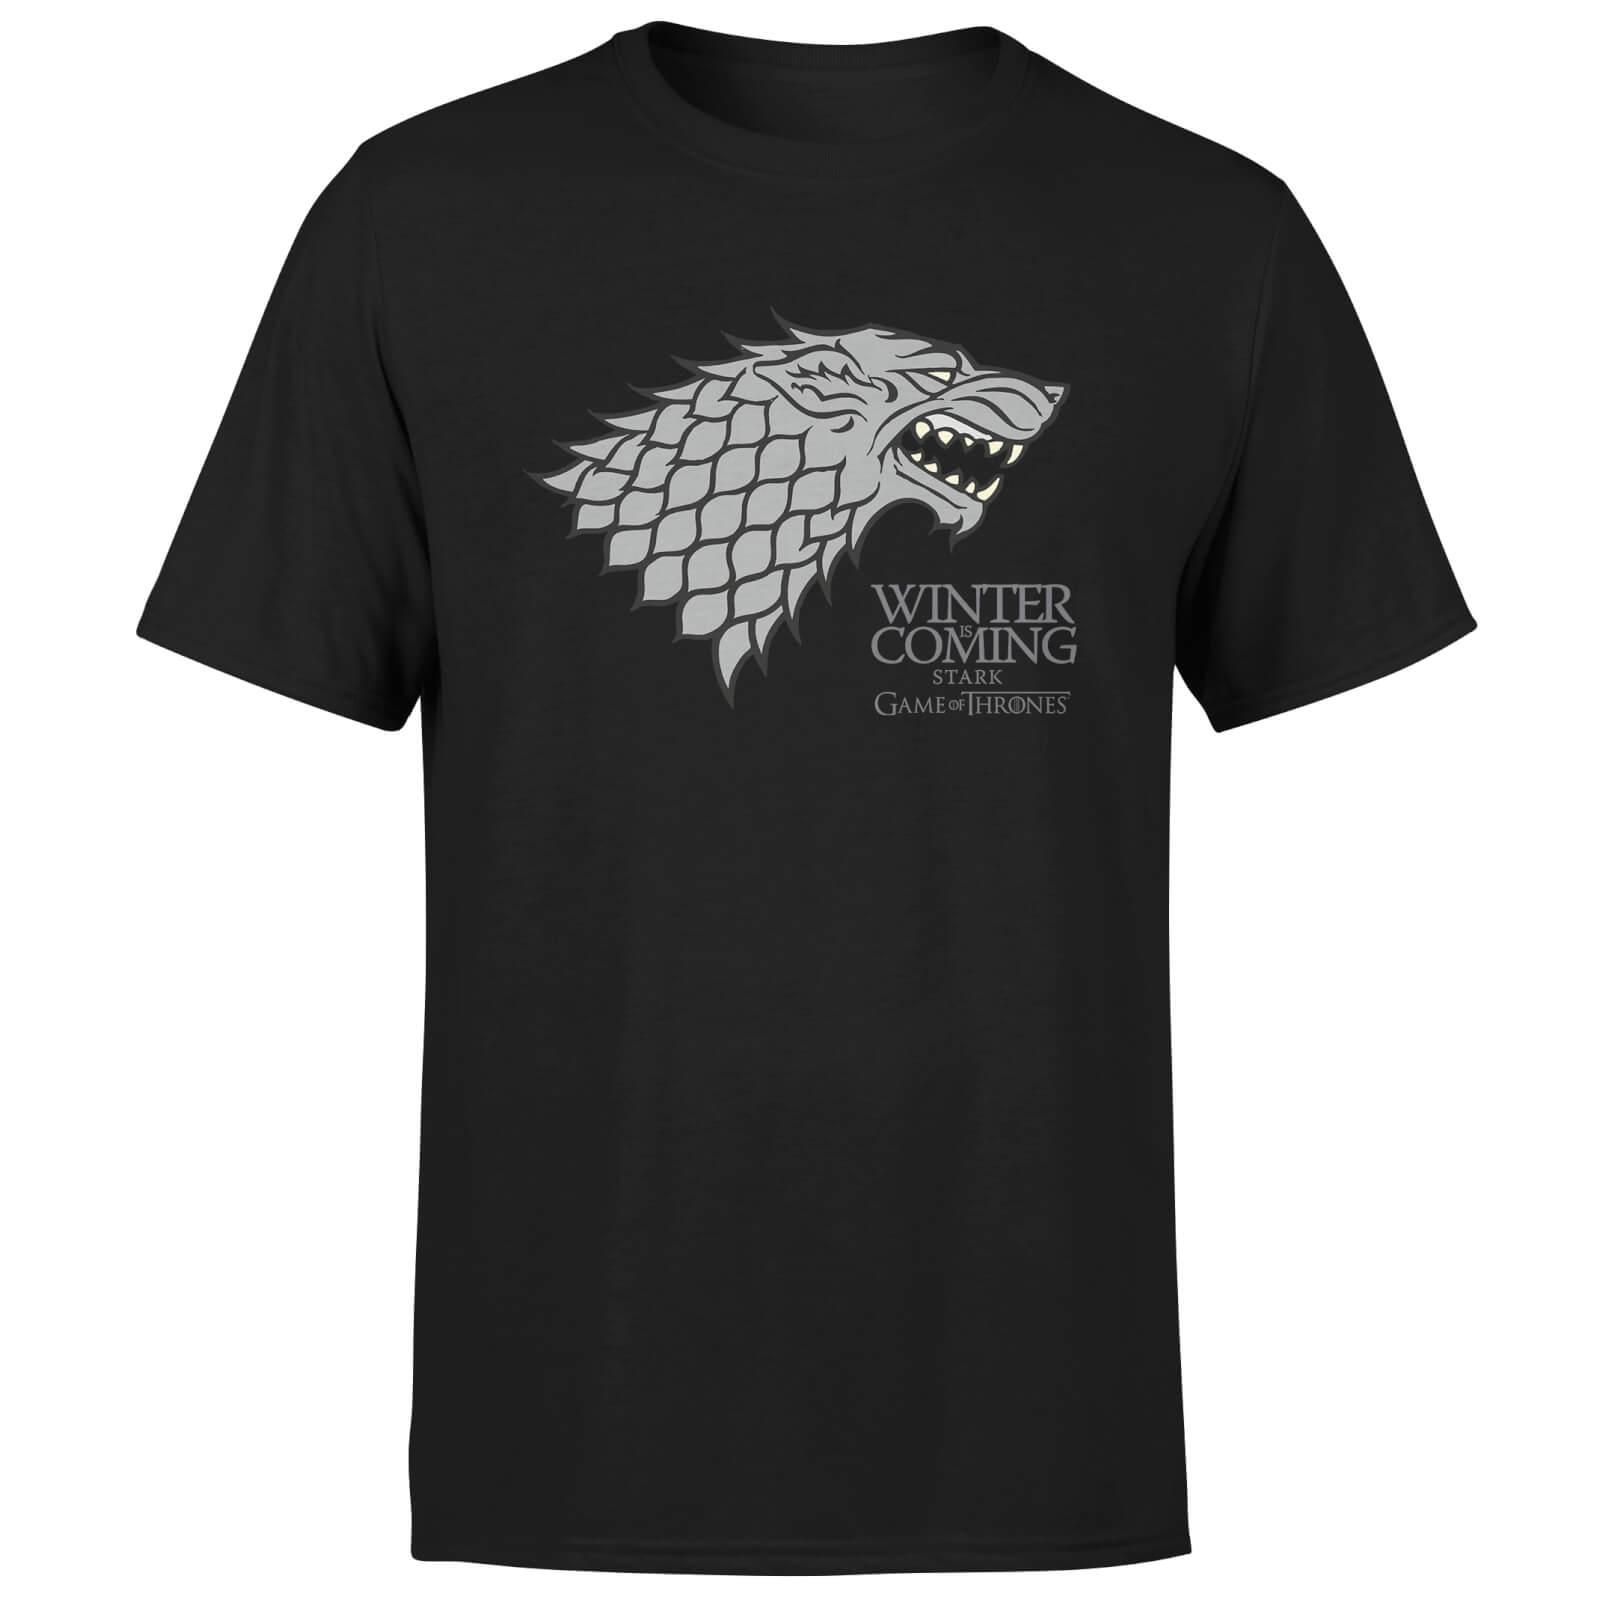 Game of Thrones - Winter is Coming T-Shirt (mit Stark-Logo, 100% Baumwolle)